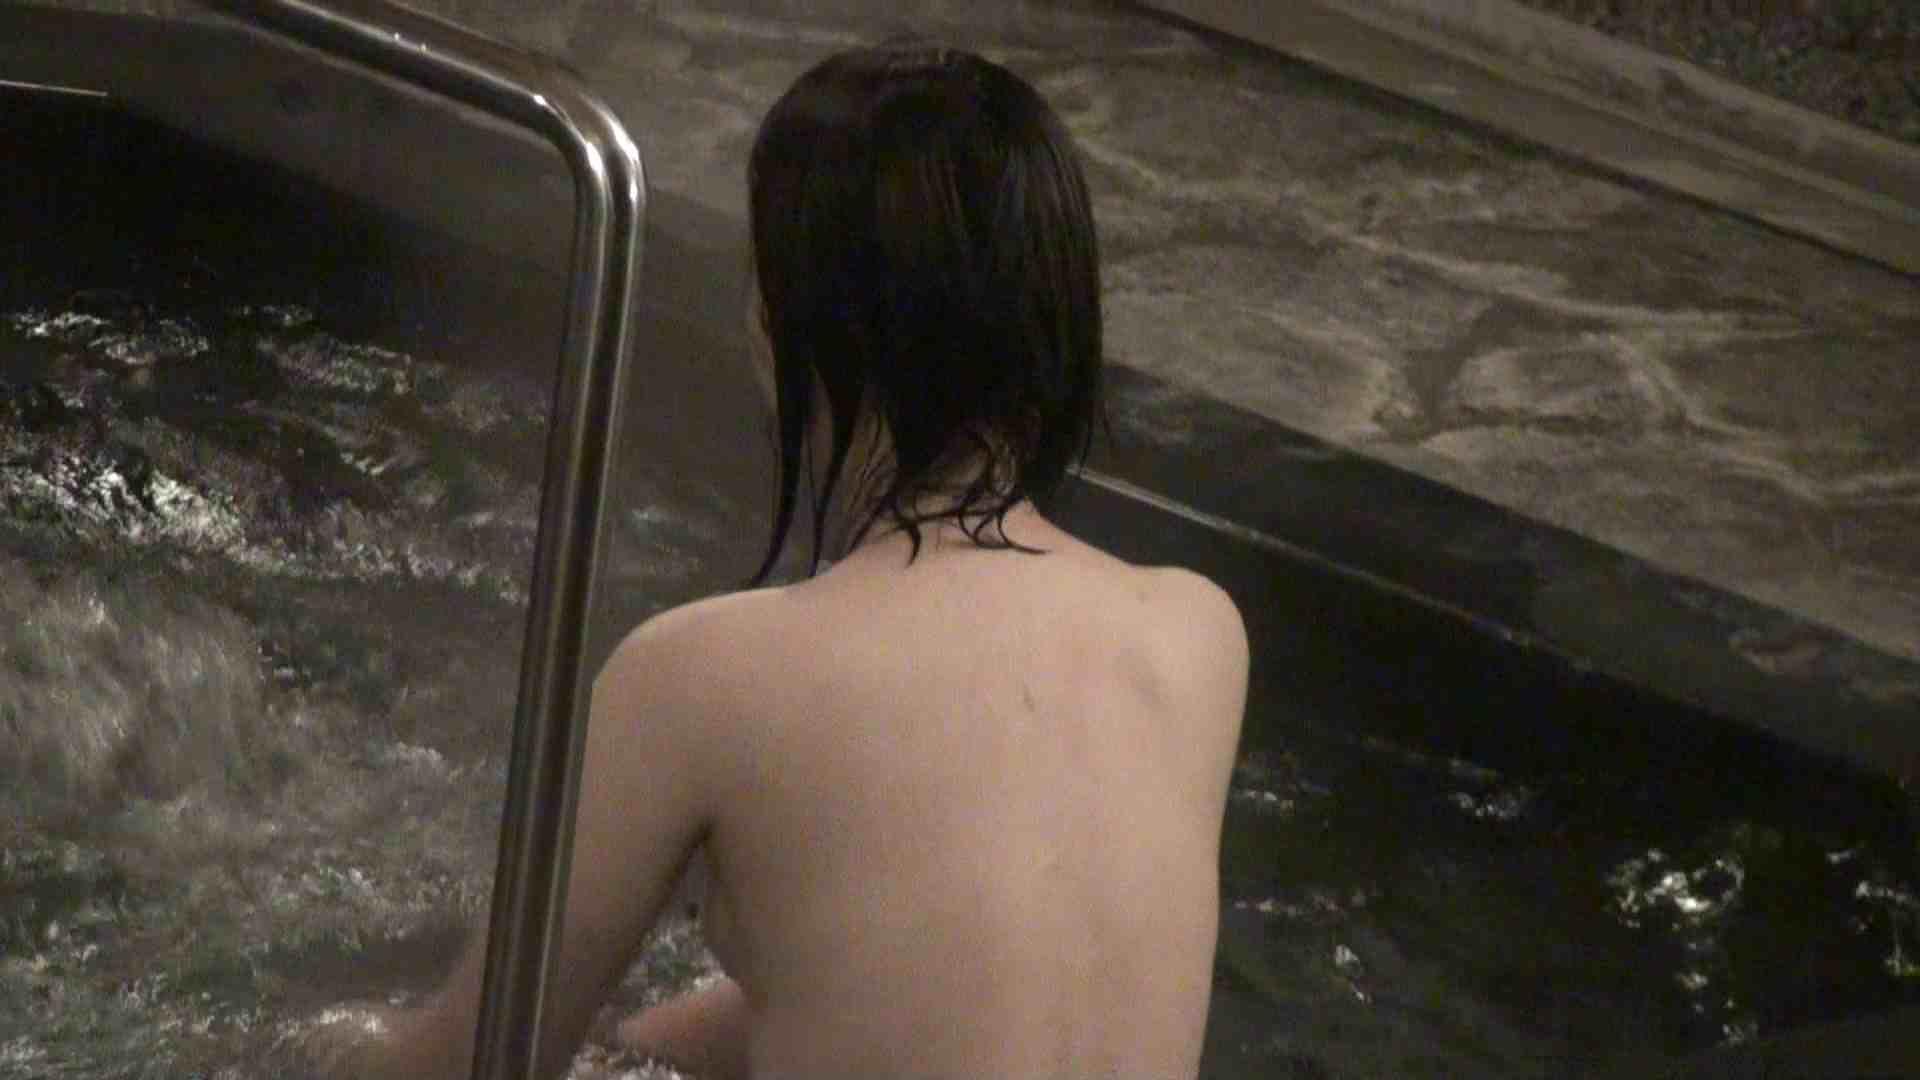 Aquaな露天風呂Vol.404 露天 おめこ無修正動画無料 112pic 47